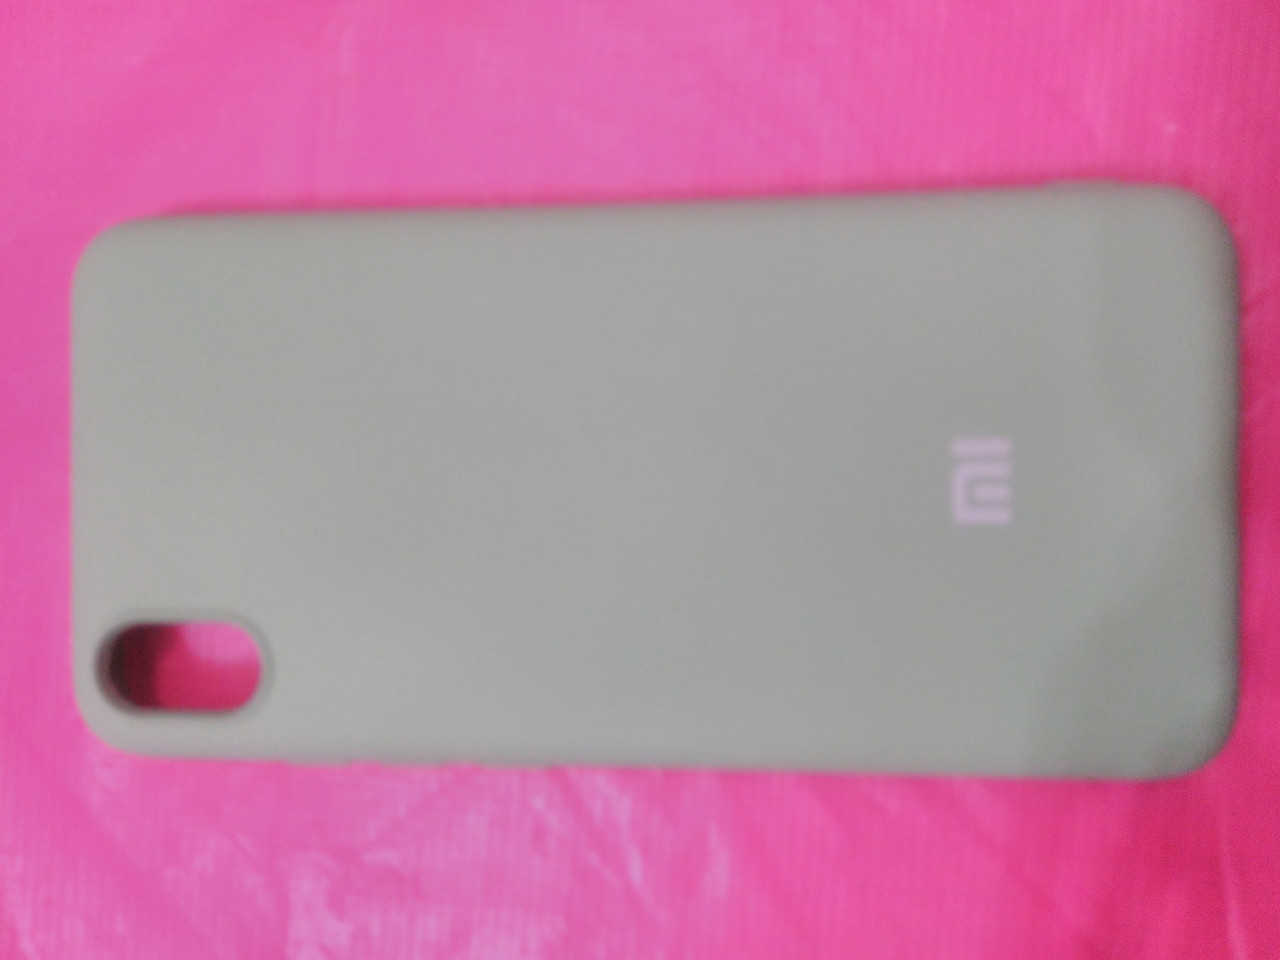 Накладка   Silicon Cover full   для  Xiaomi Redmi 7A (мятный)